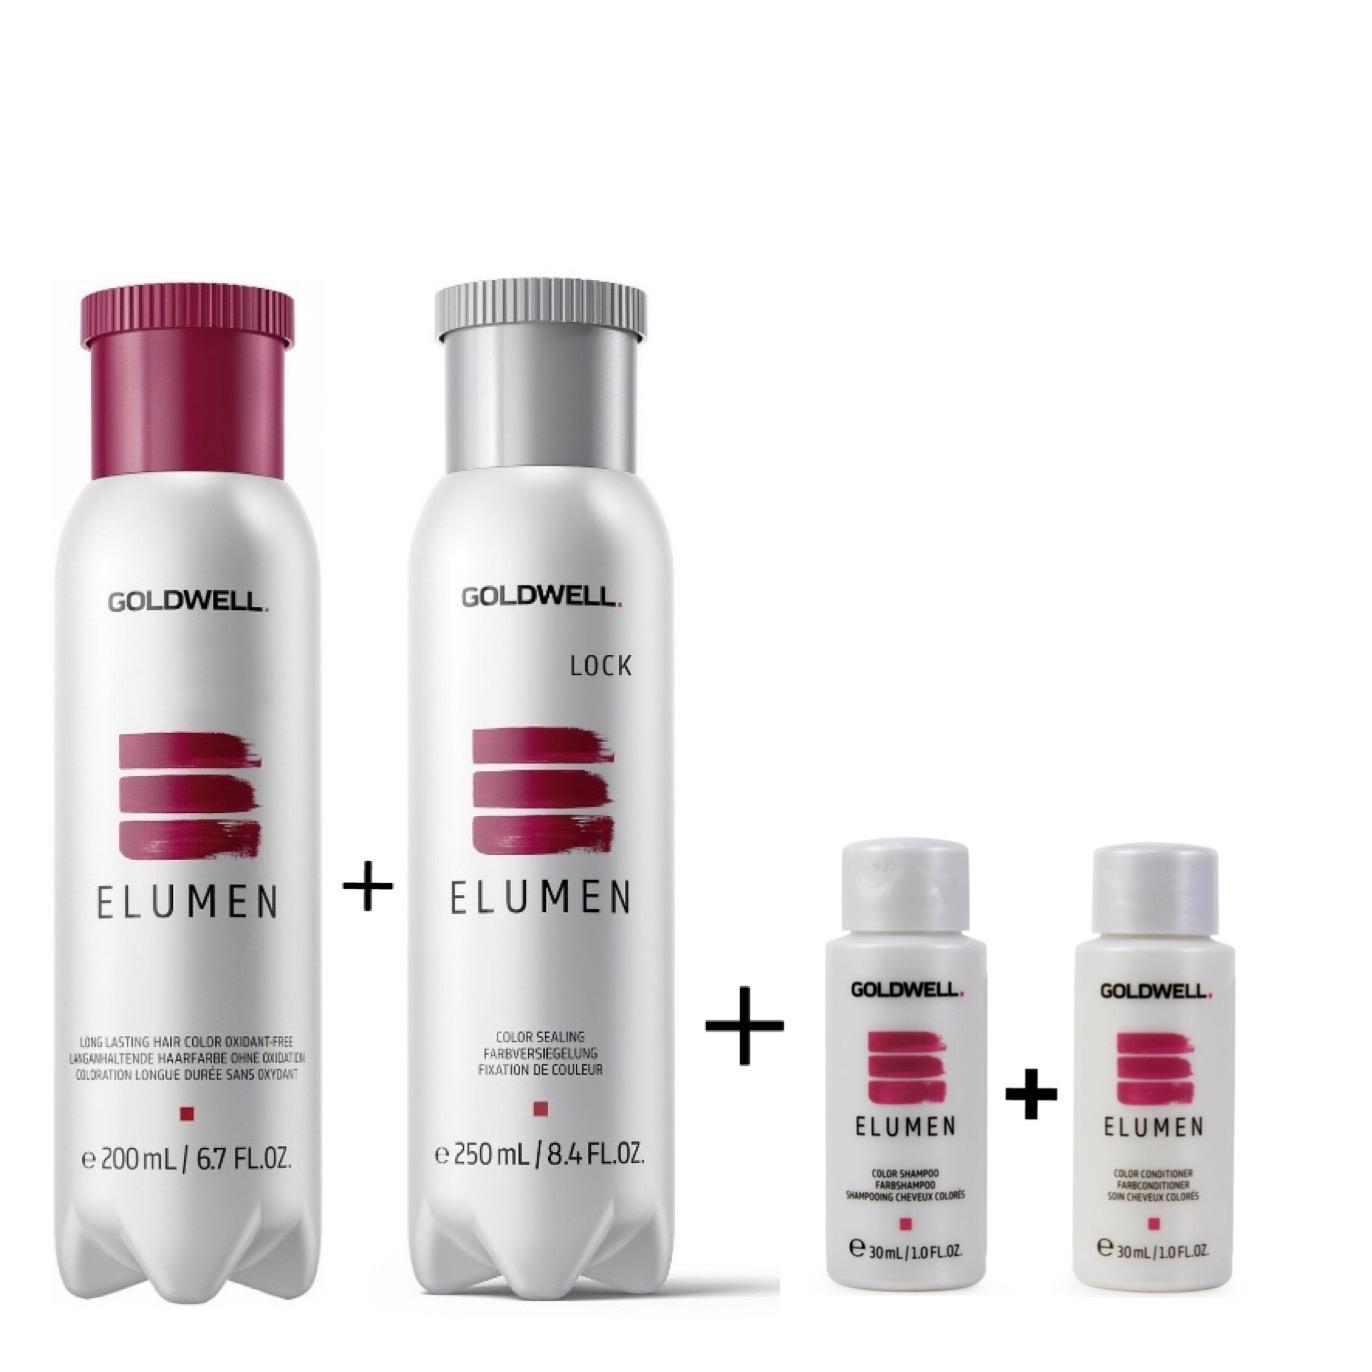 Goldwell Elumen Haarfarbe [RR@all Rot] 200ml + 250ml Lock Versiegelung + 30ml Color Shampoo + 30ml Color Conditioner